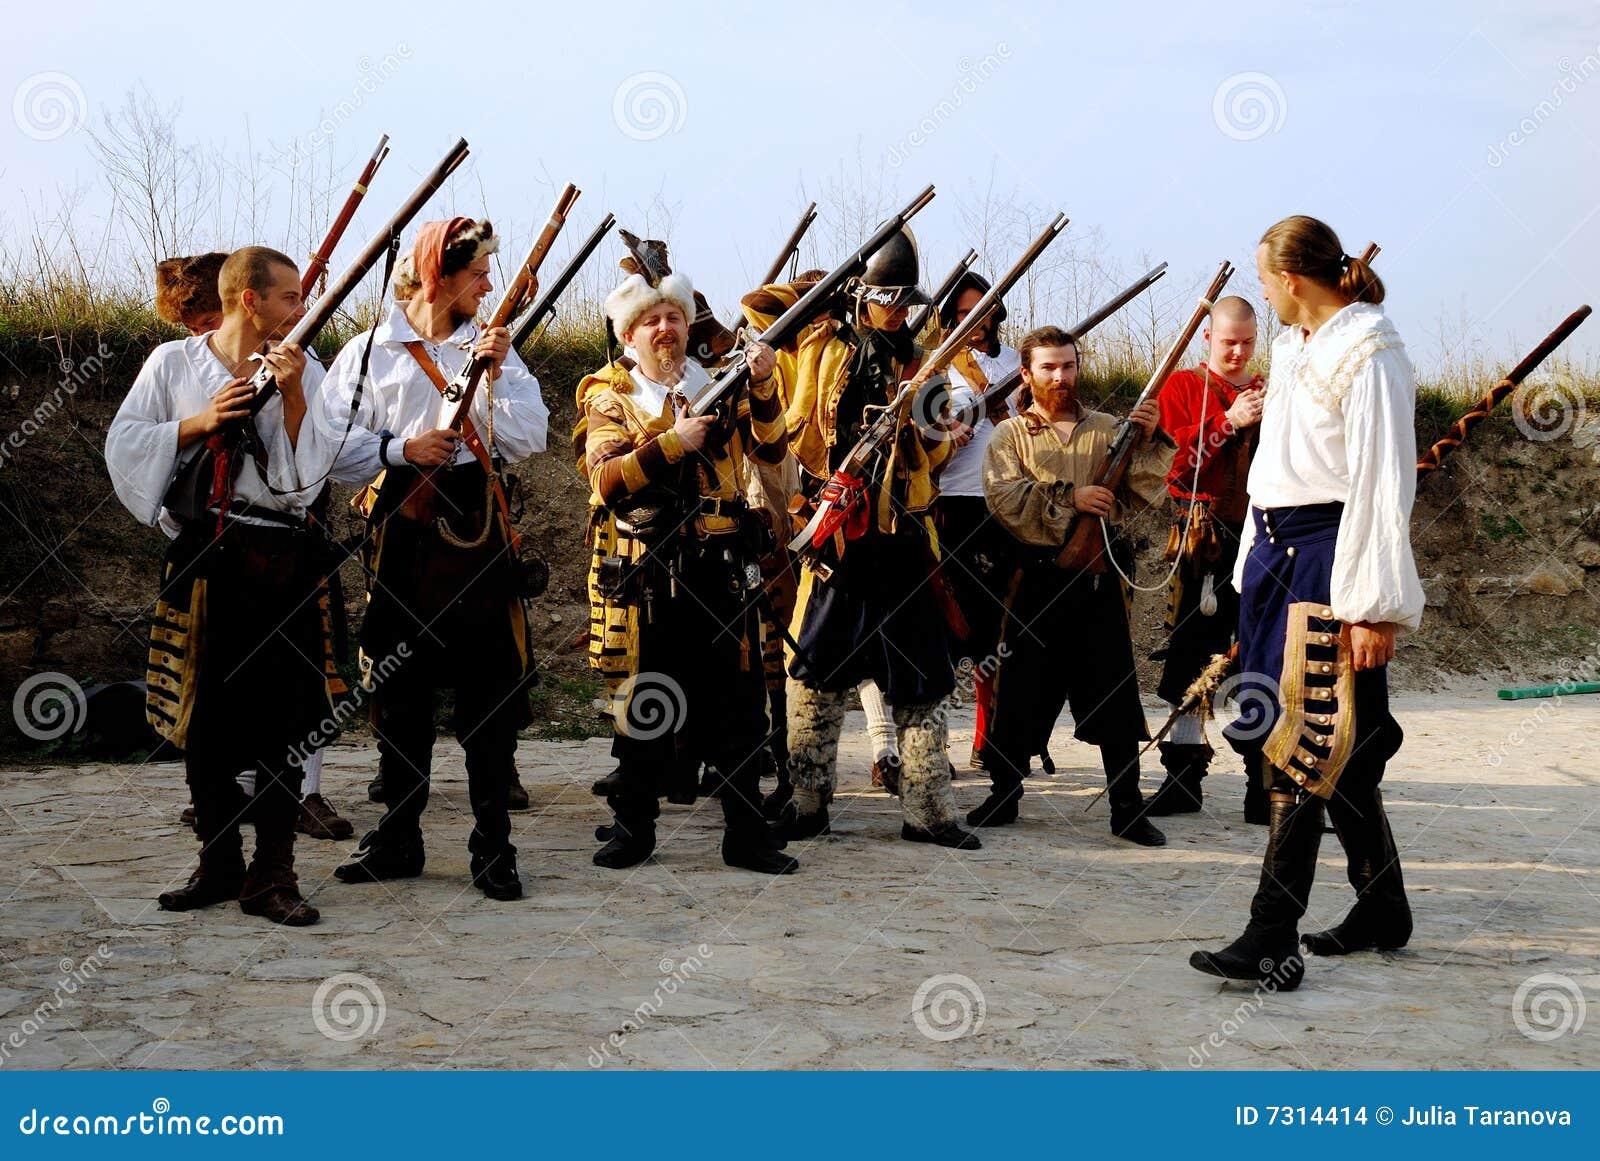 Esercito medioevale